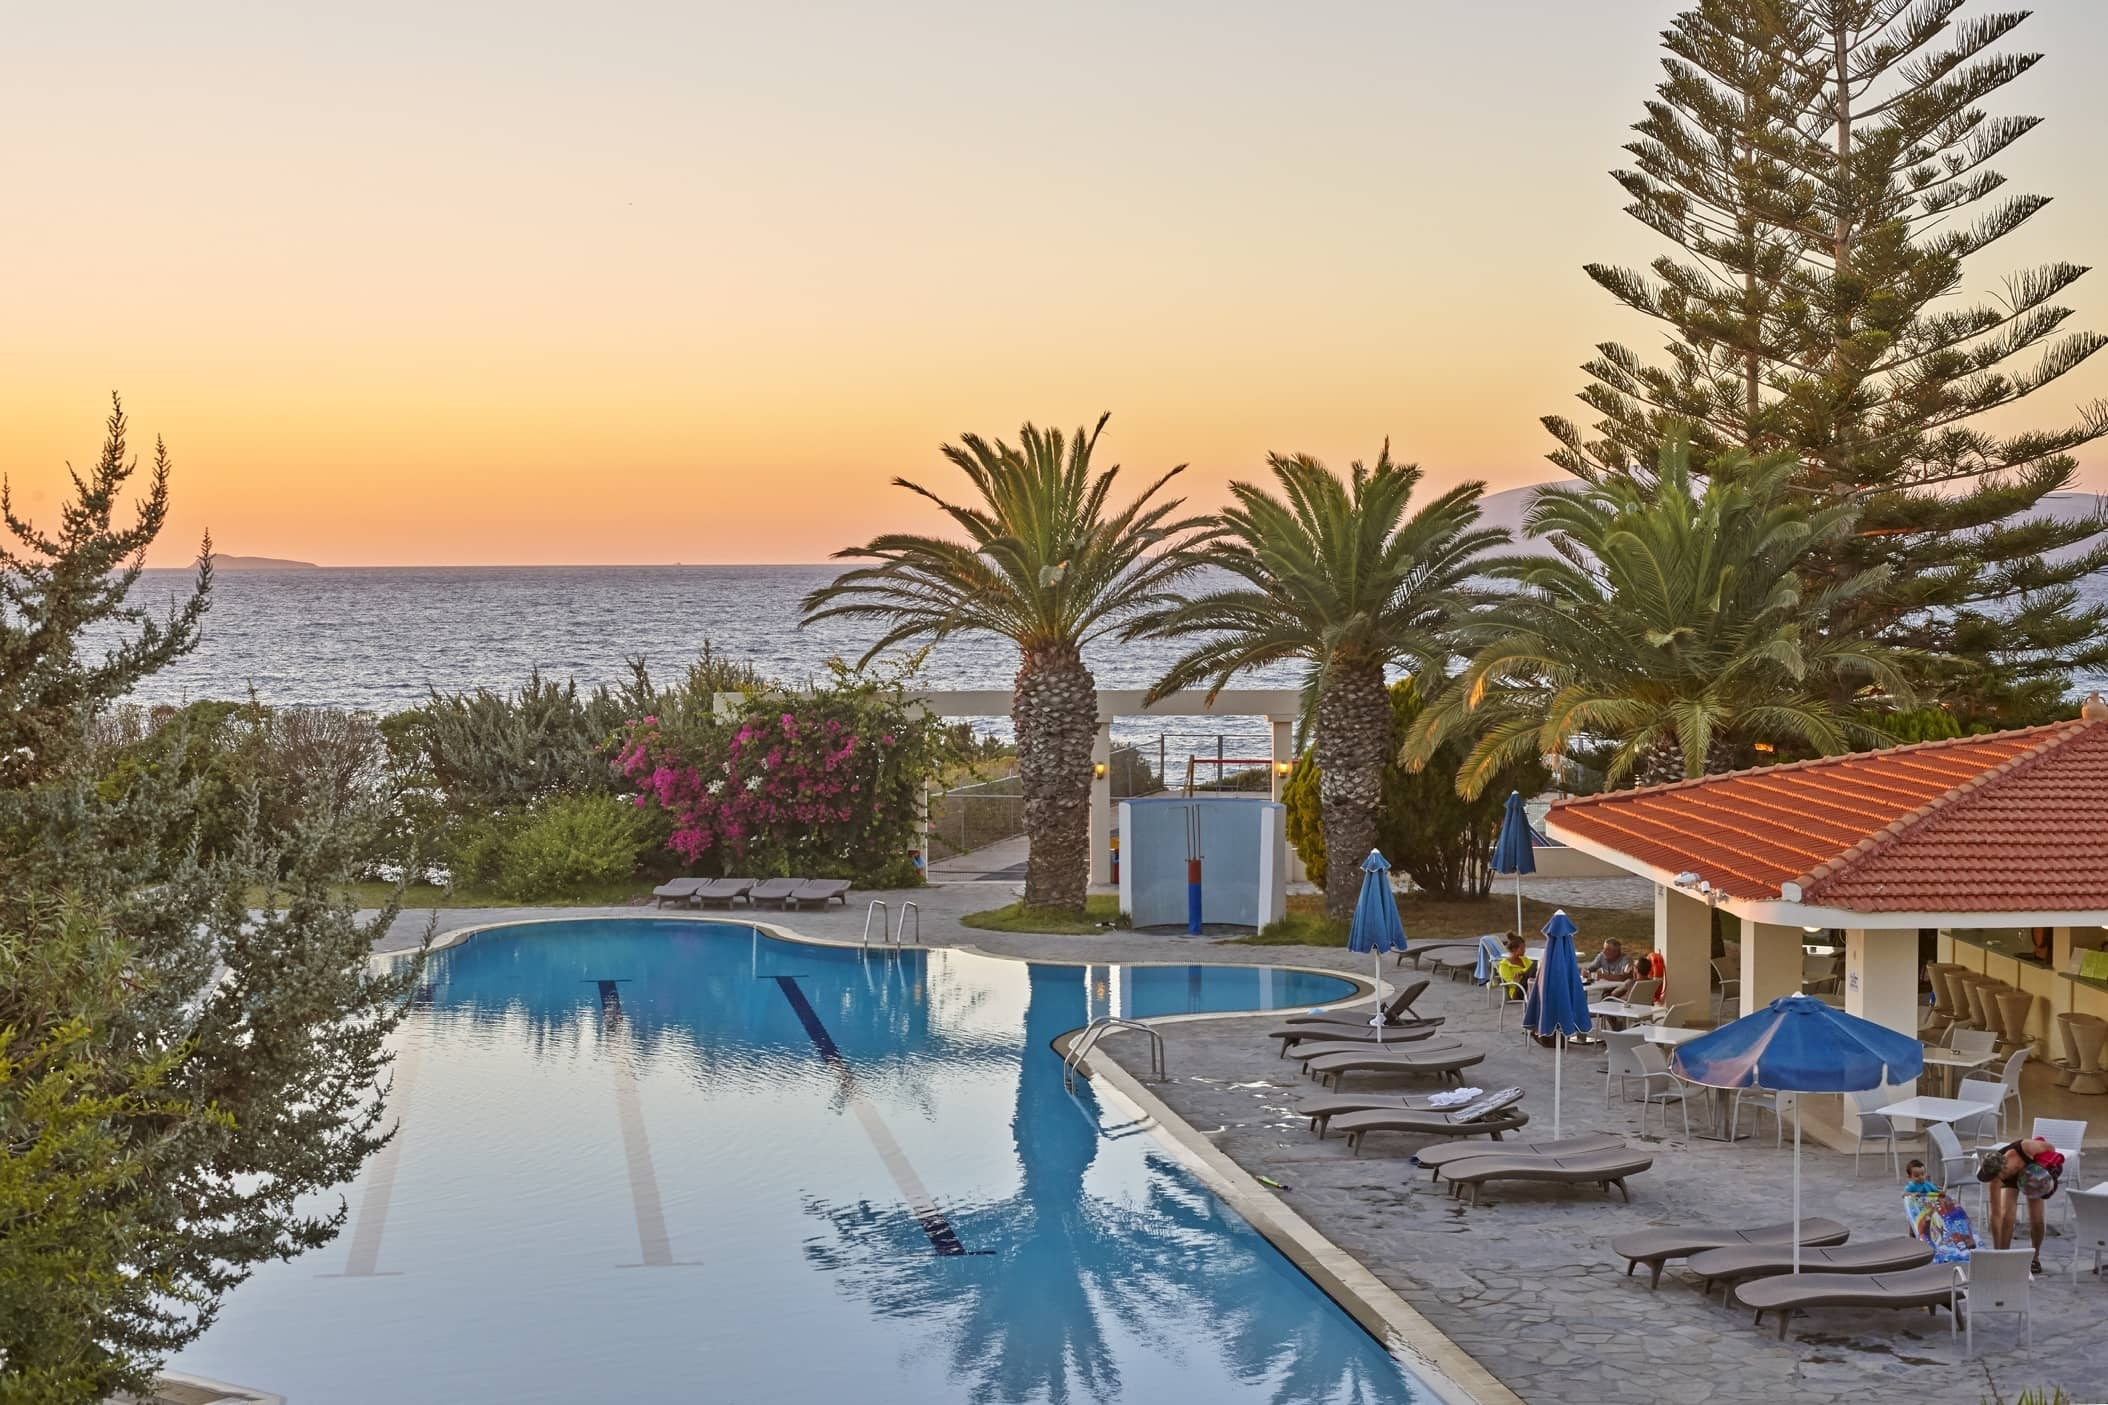 4* Ammos Resort - Μαστιχάρι, Κως ✦ -49% ✦ 4 Ημέρες